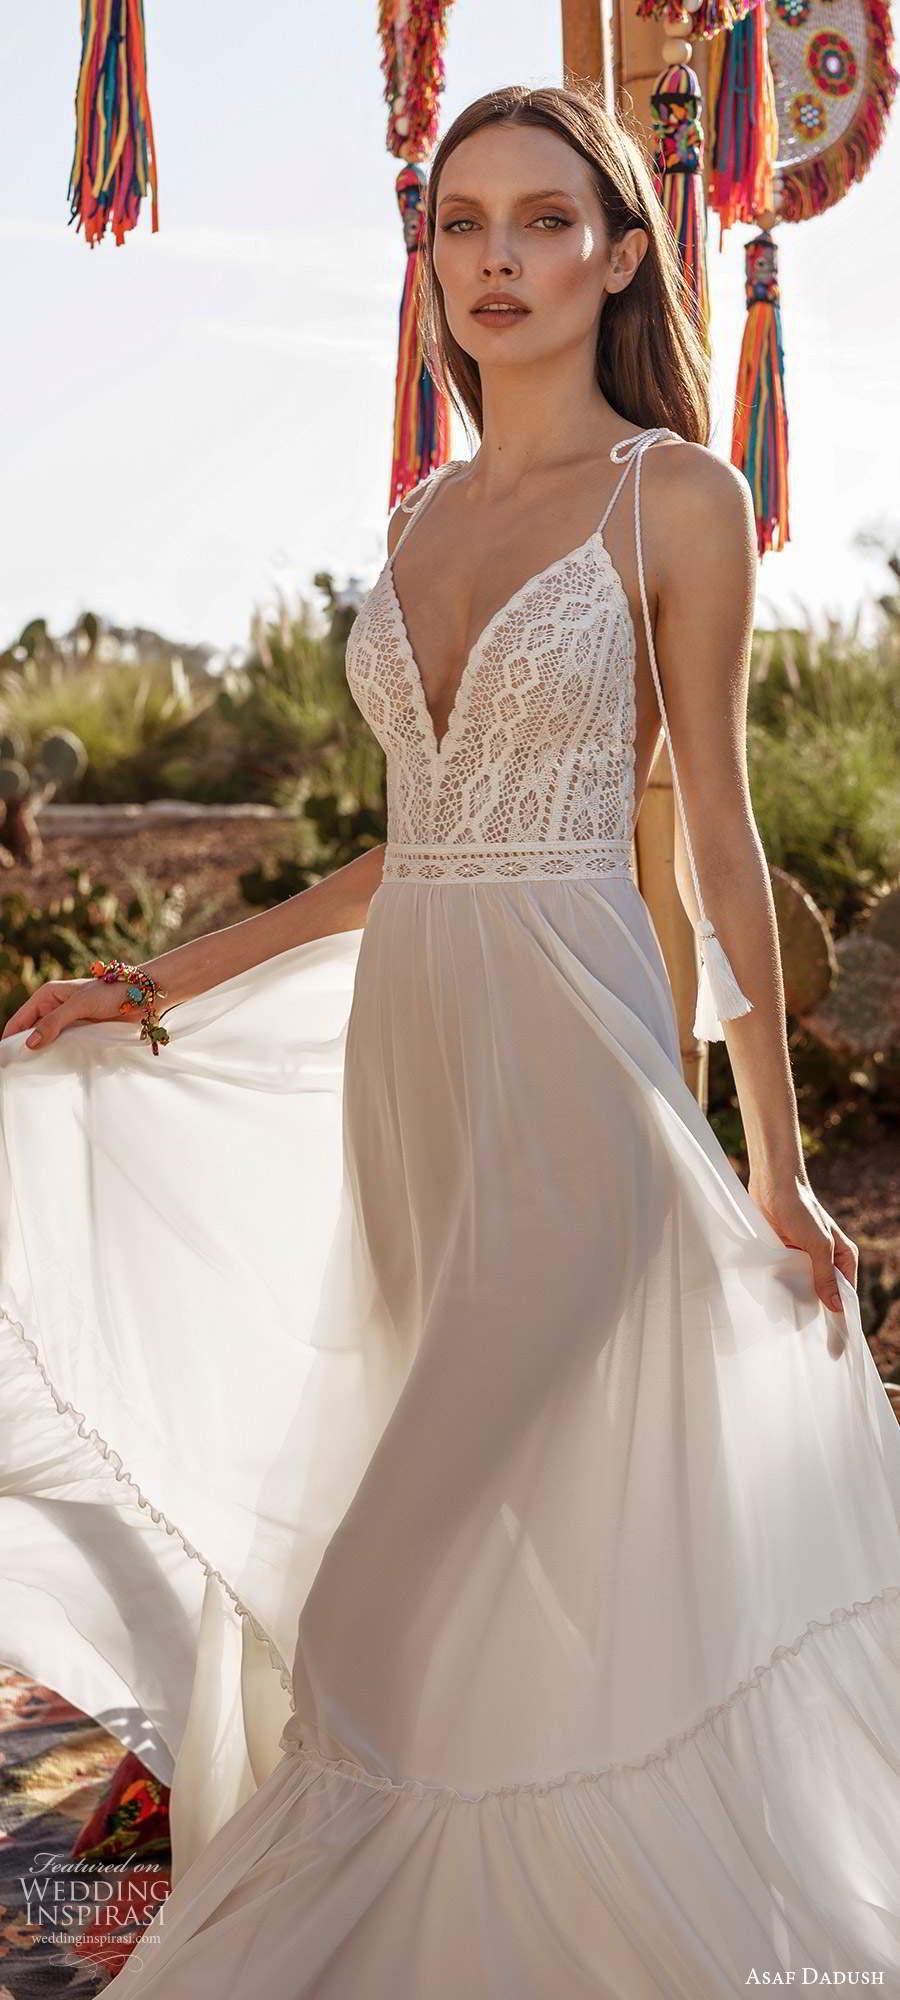 asaf dadush 2020 bridal sleeveless thin straps bow plunging v neckline embellished bodice clean skirt a line wedding dress open back (9) zv